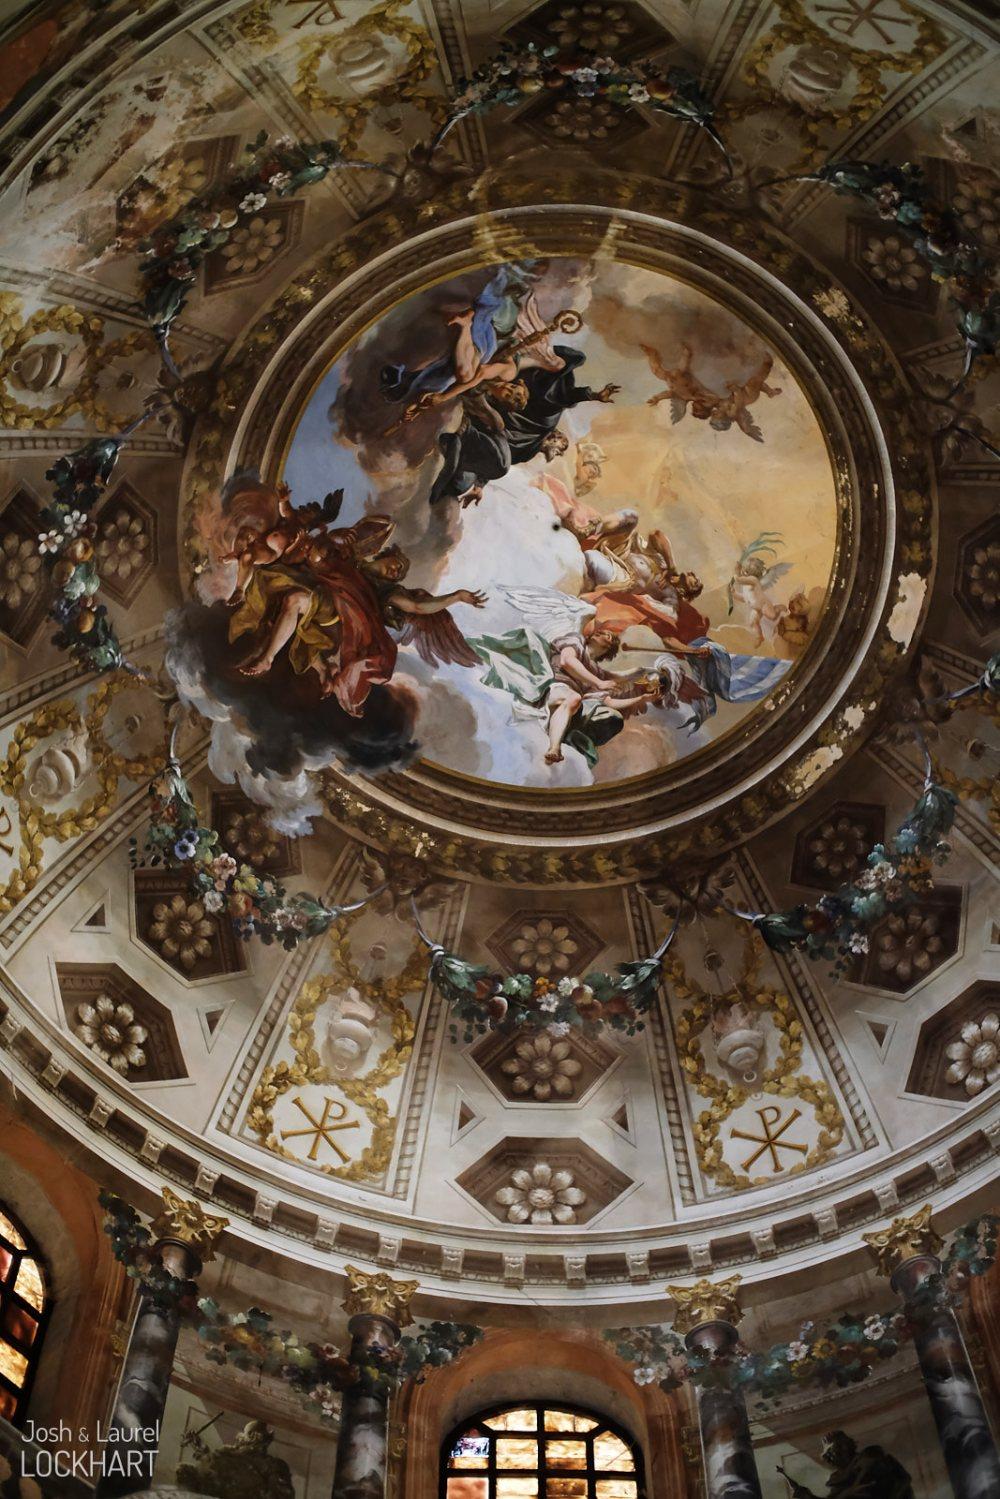 Ceiling of Basilica di San Vitale